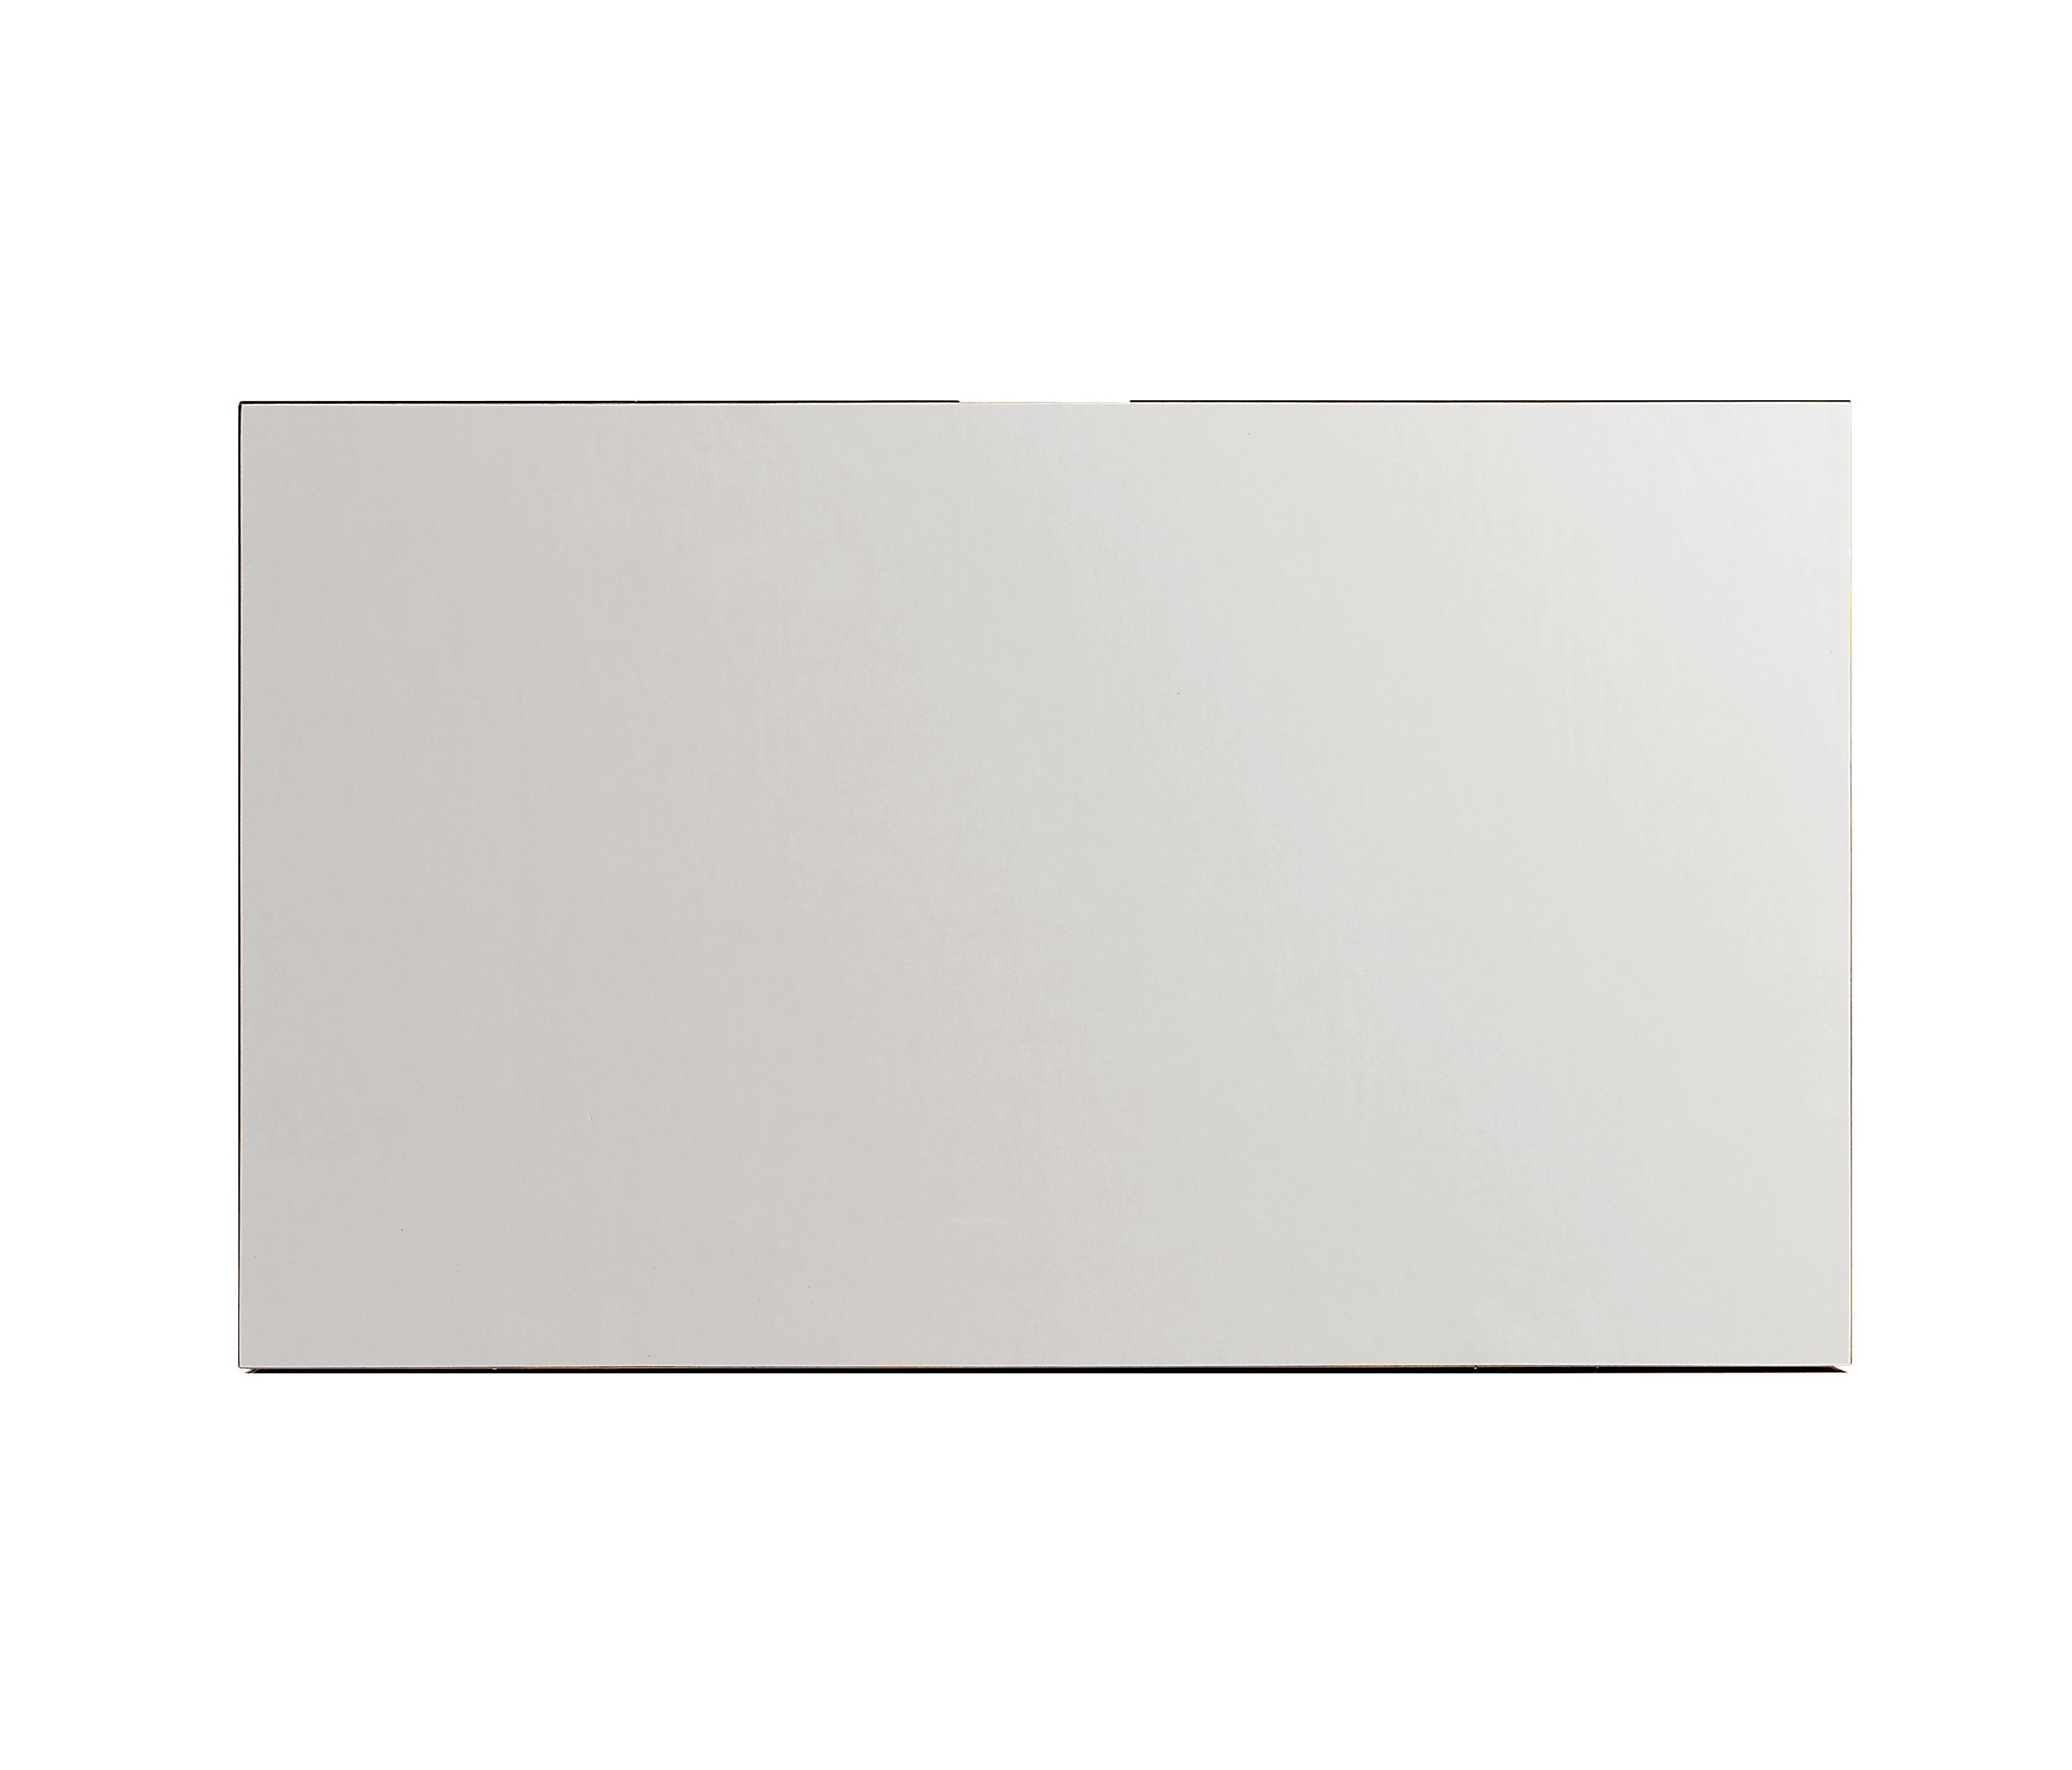 flatbox regale von m ller m belwerkst tten architonic. Black Bedroom Furniture Sets. Home Design Ideas